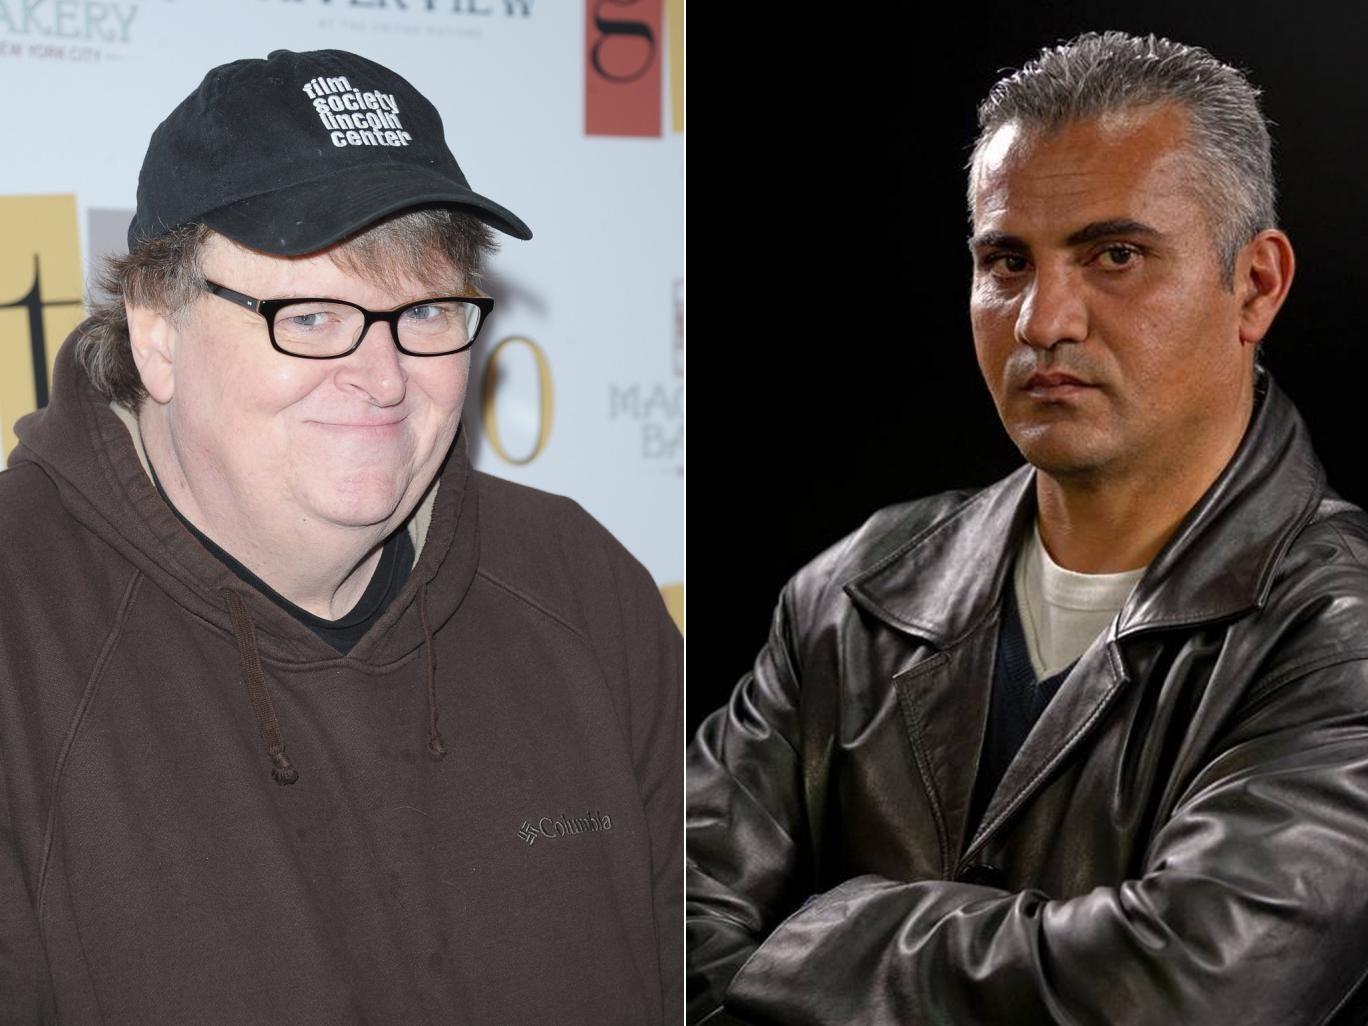 American filmmaker Michael Moore and Palestinian director Emad Burnat